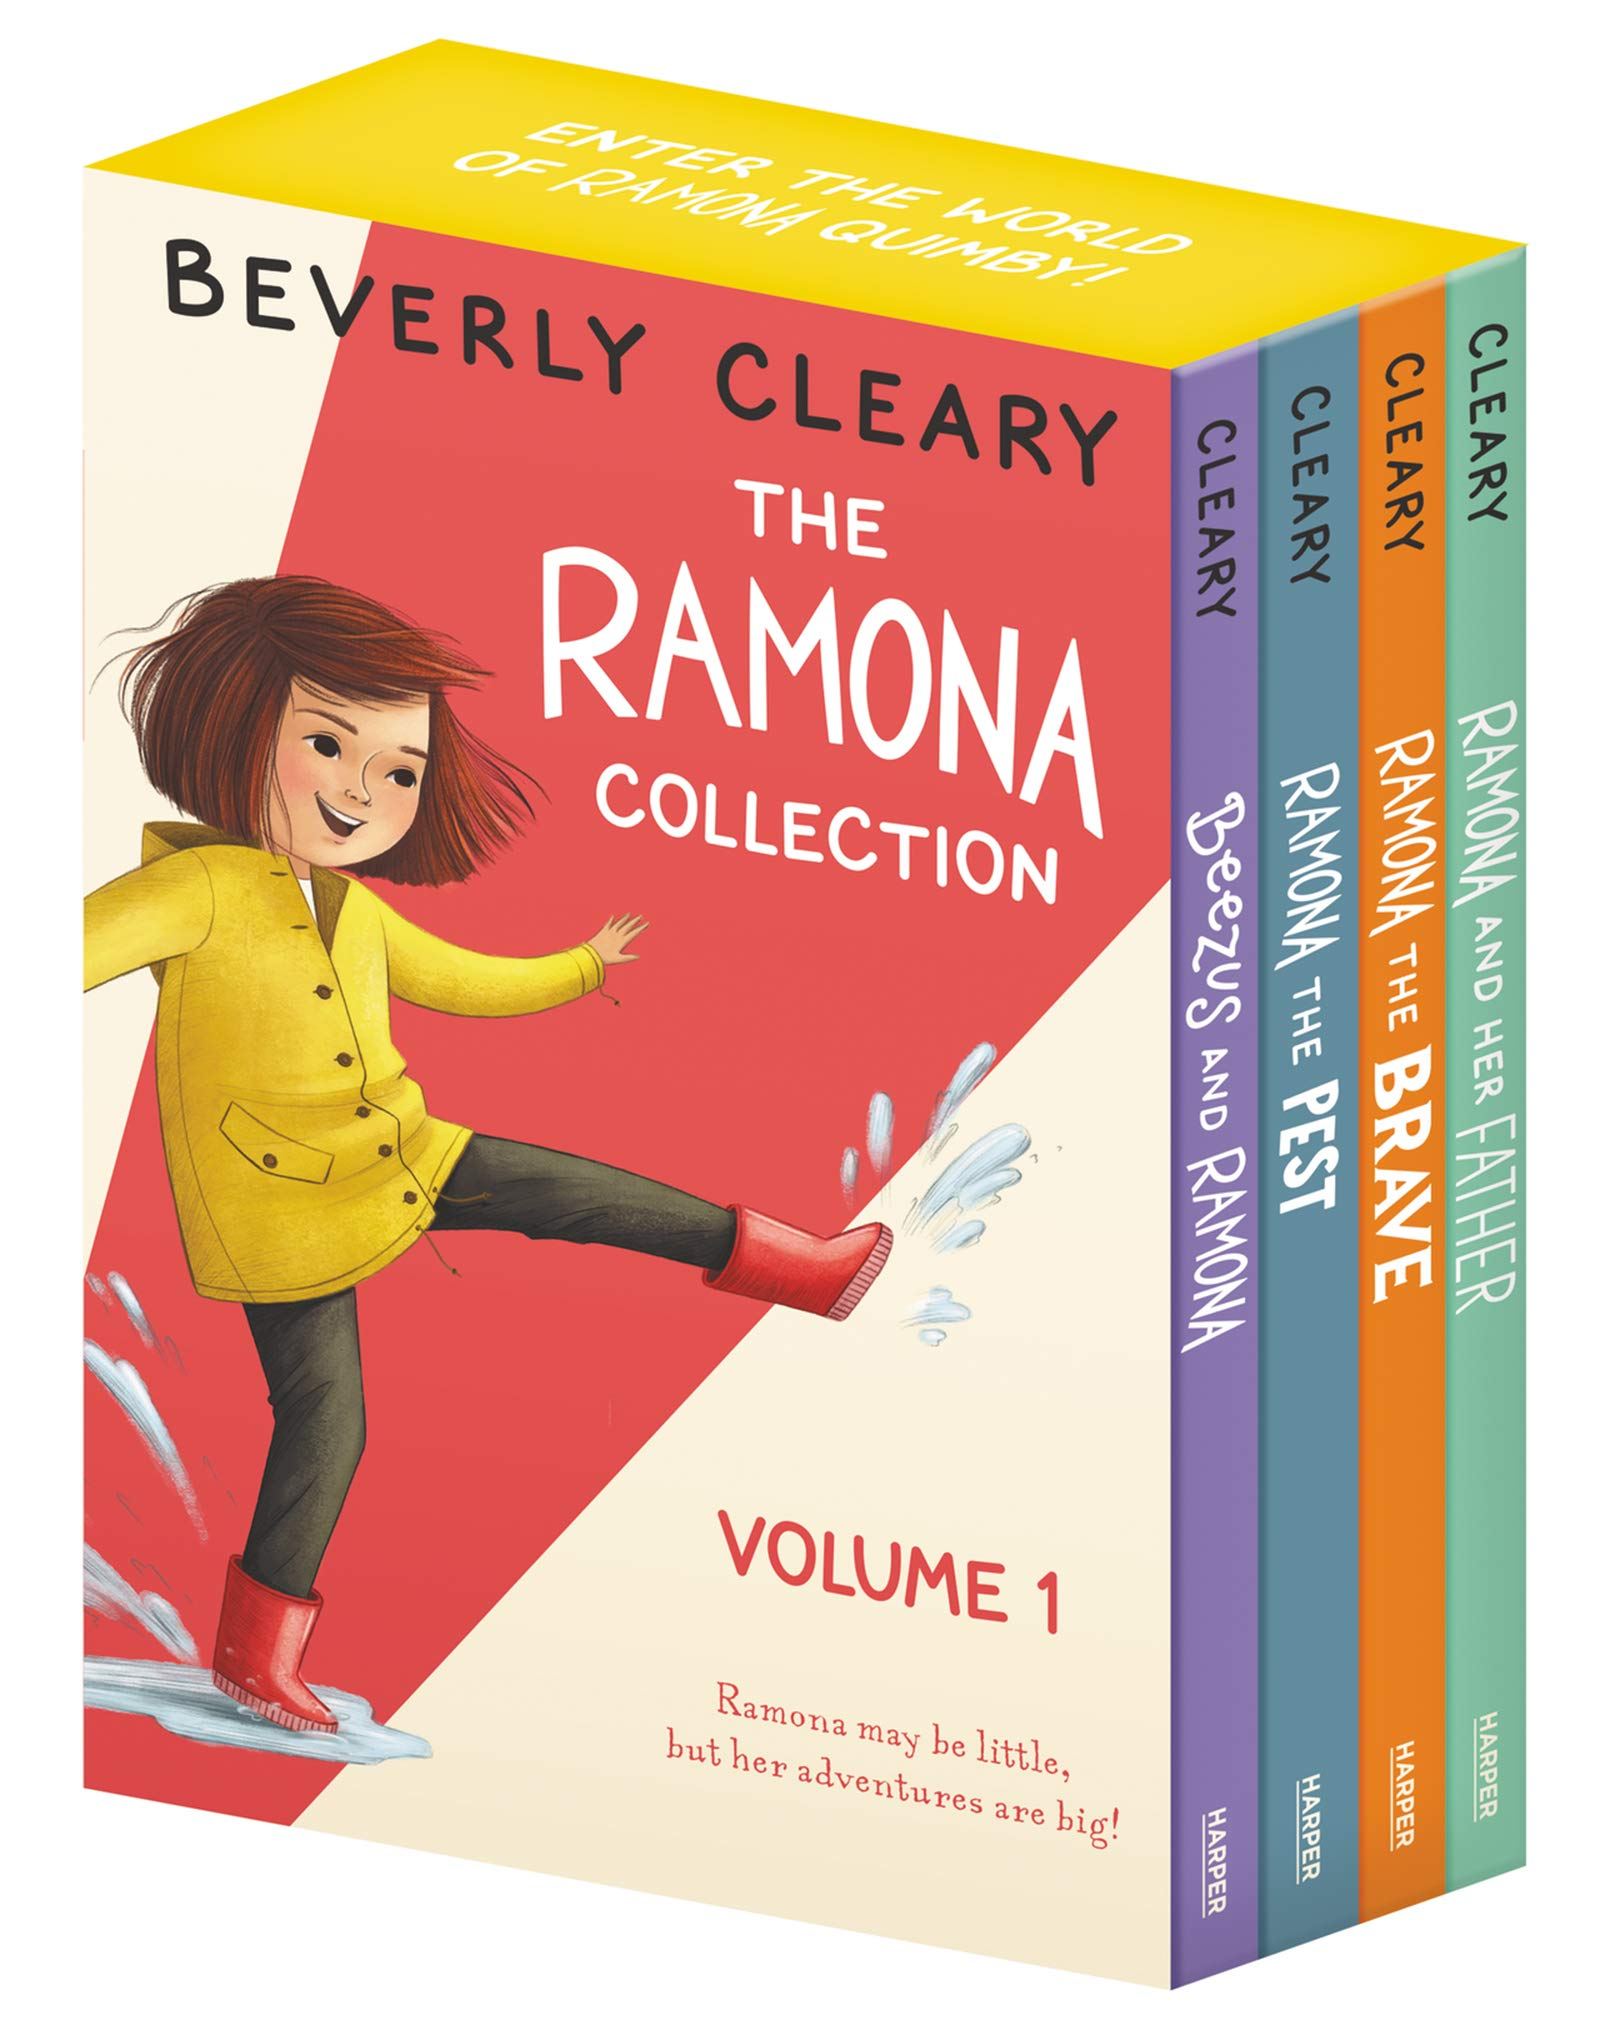 The Ramona Assortment, Vol. 1: Beezus and Ramona / Ramona the Pest / Ramona the Courageous / Ramona and Her Father [4 Book Box set]